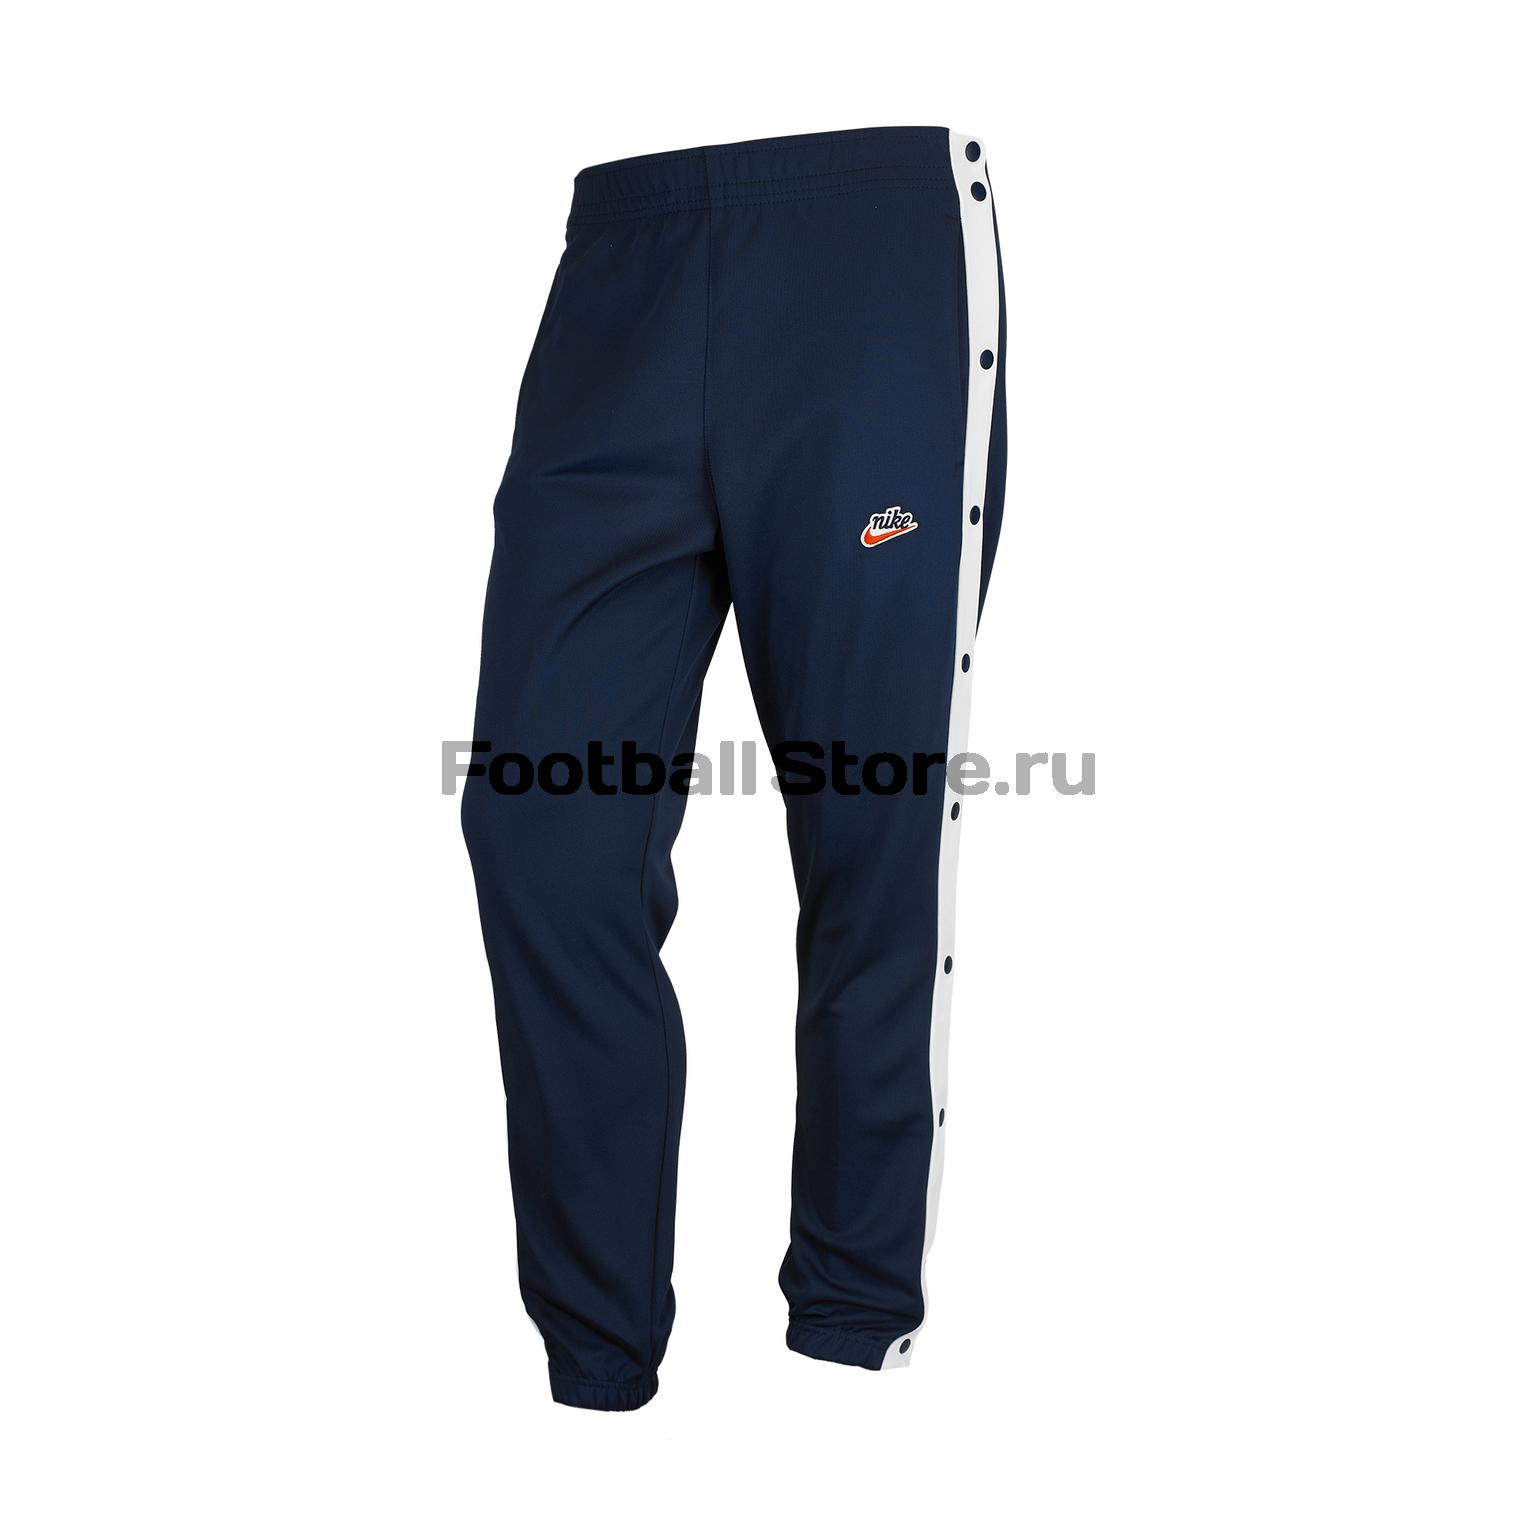 Брюки Nike Pant Tearaway BV2627-410 цена 2017